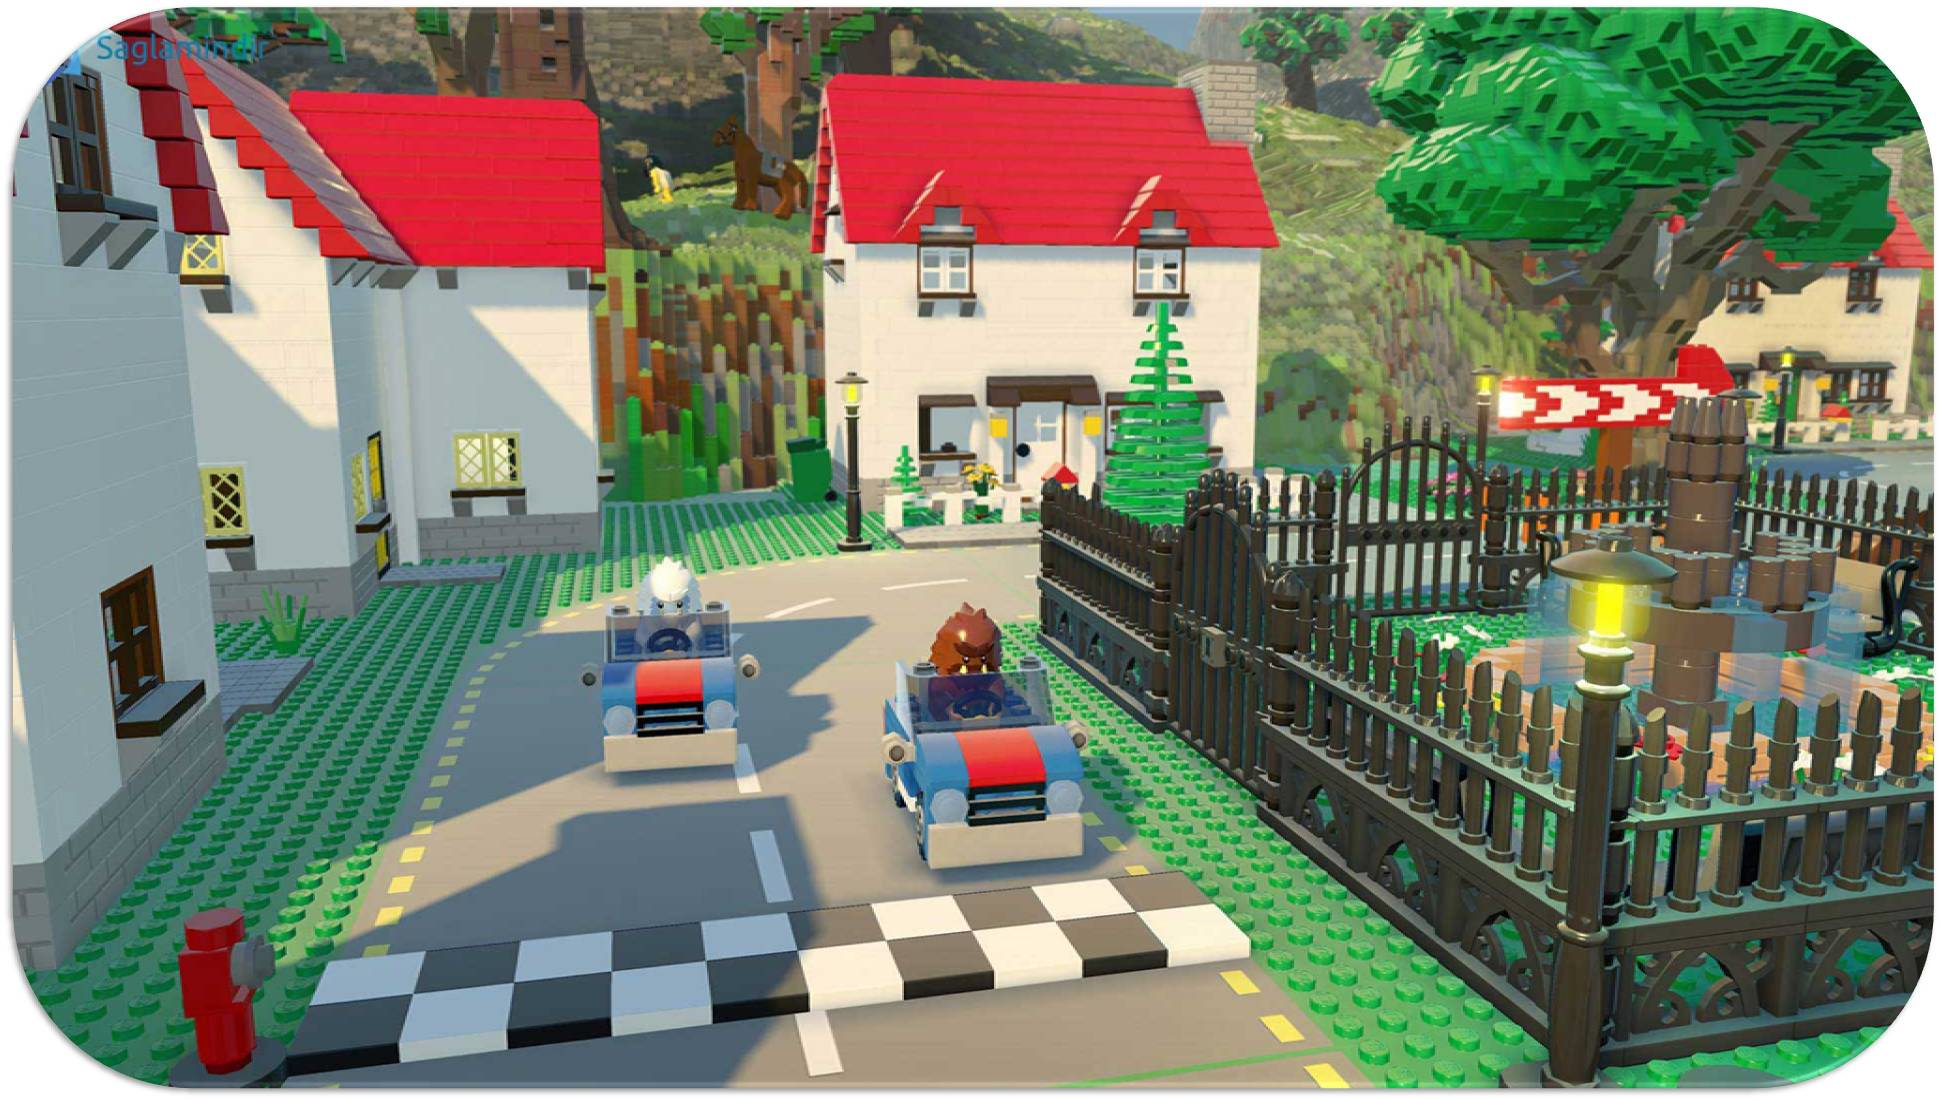 Lego Worlds saglamindir